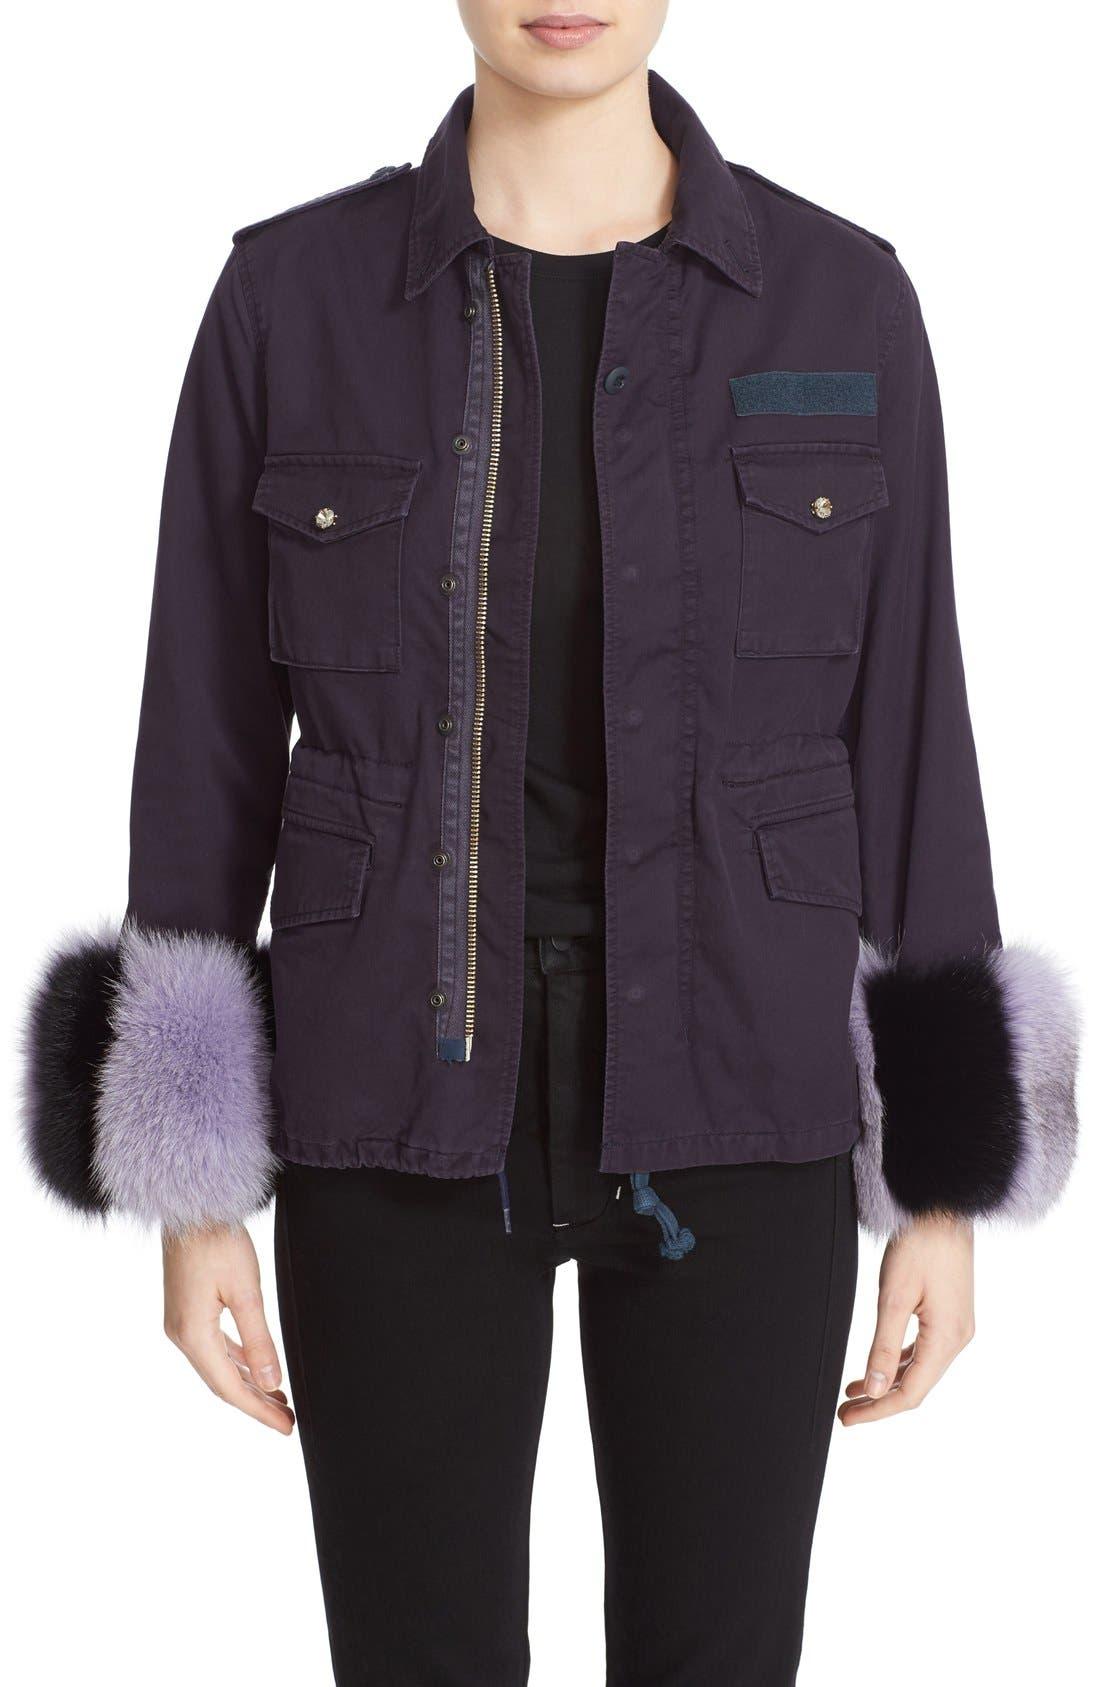 Tu es mon TRÉSOR Military Jacket with Genuine Fox Fur Cuffs